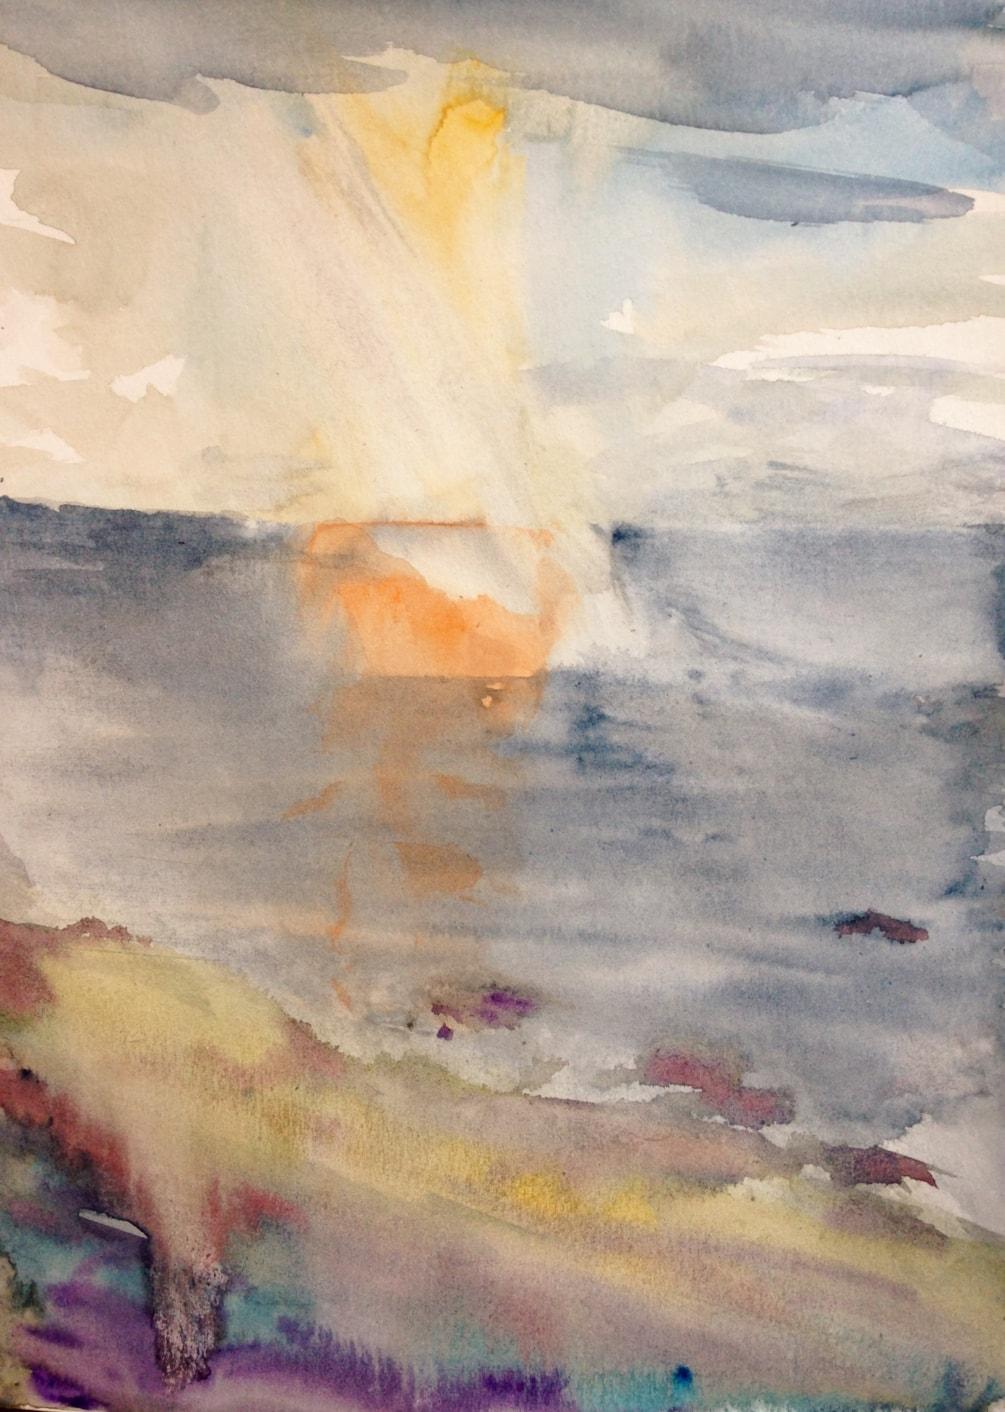 Seascape 2 (quick sketch)